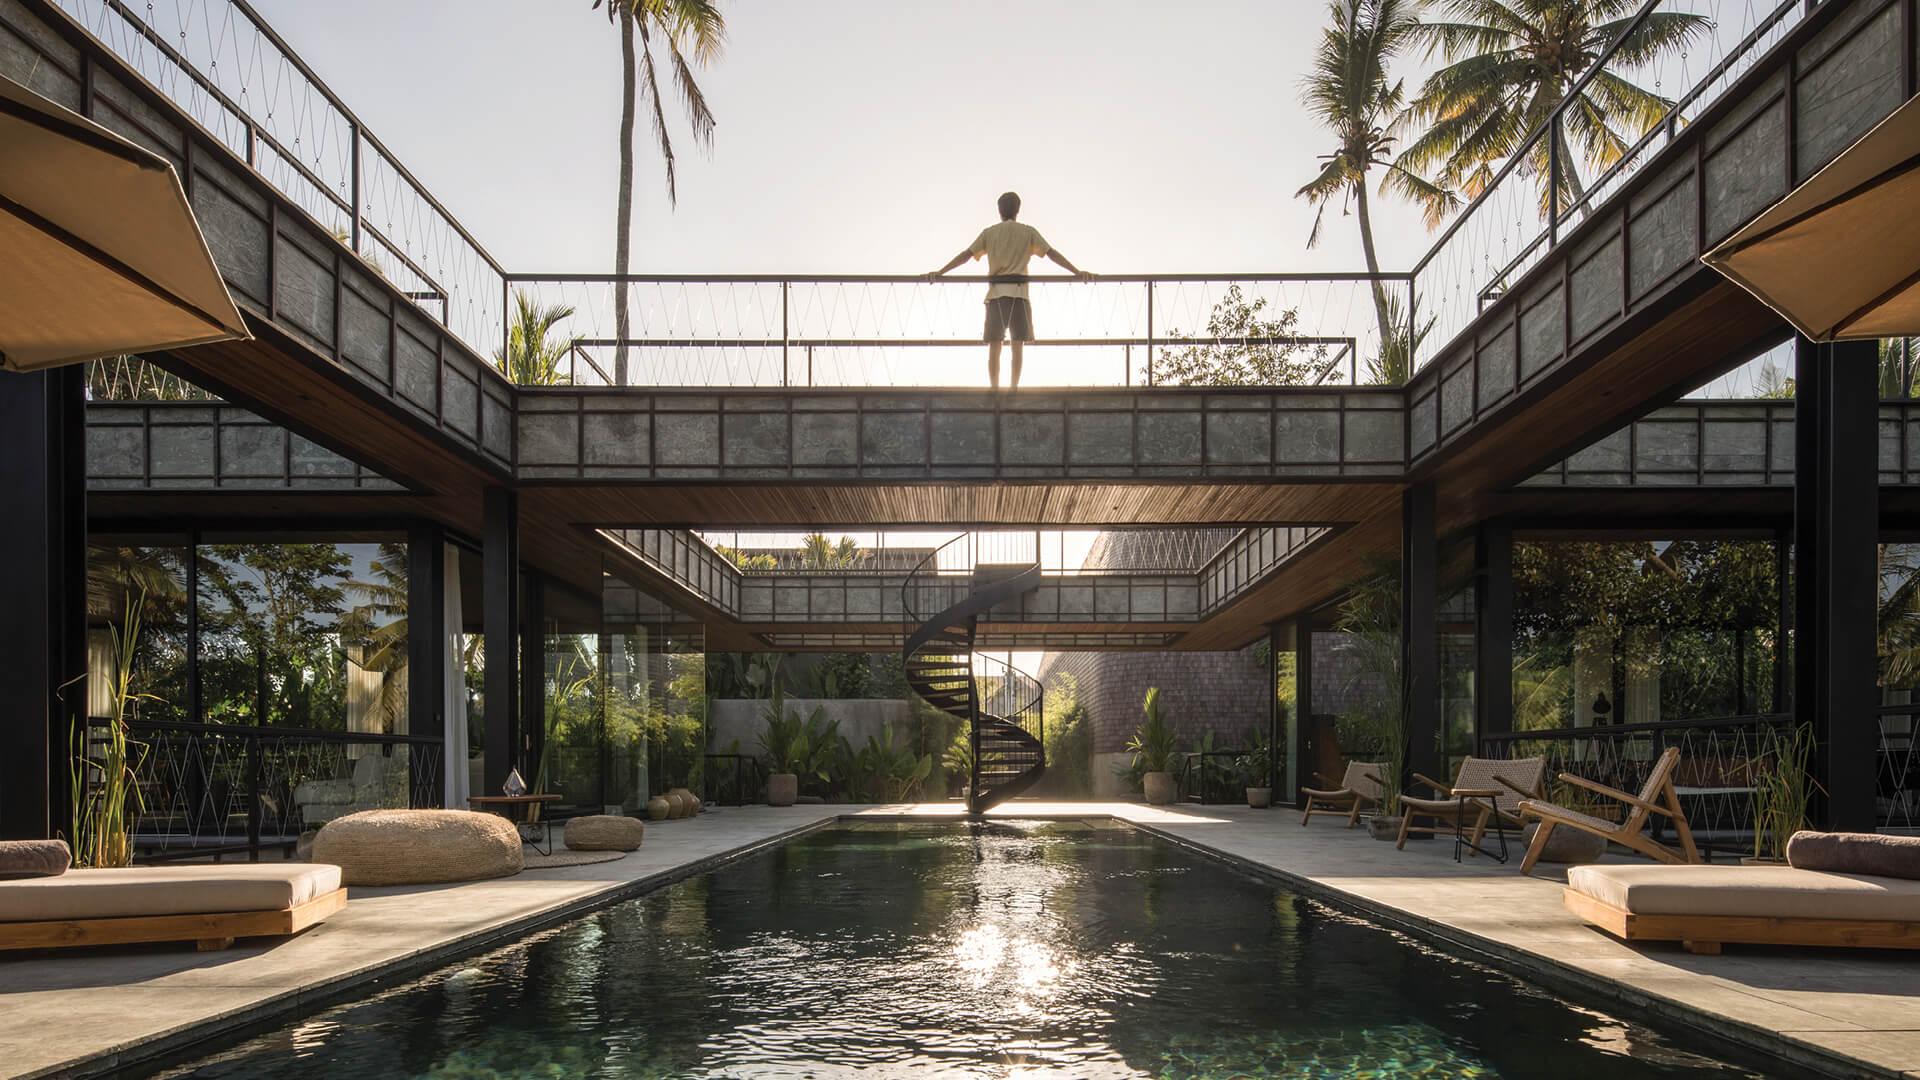 Bond House by Alexis Dornier in Ubud, Bali, Indonesia | Bond House by Alexis Dornier | STIRworld